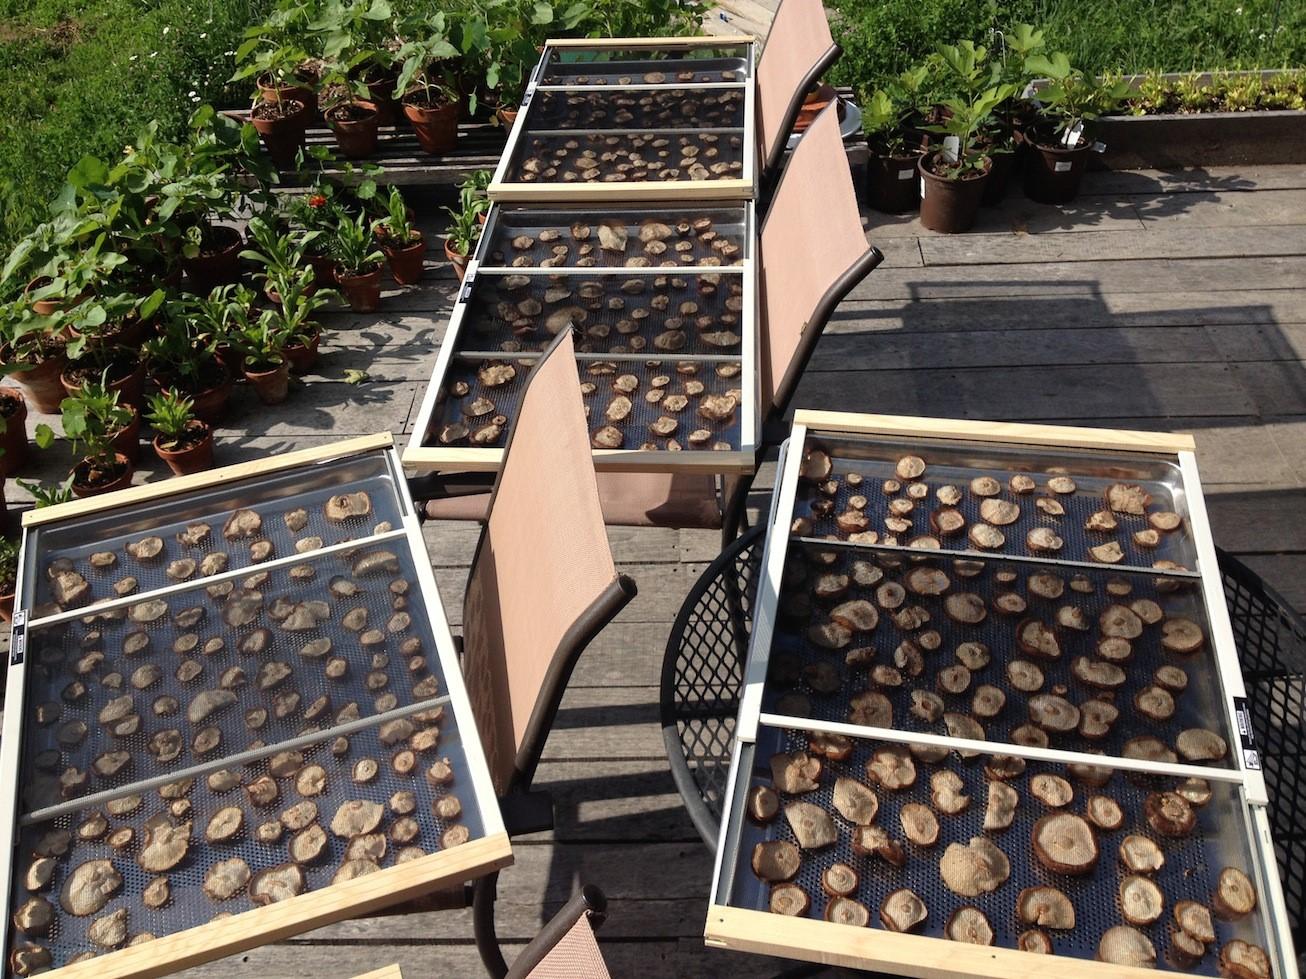 Mushrooms drying on racks in the sunshine.